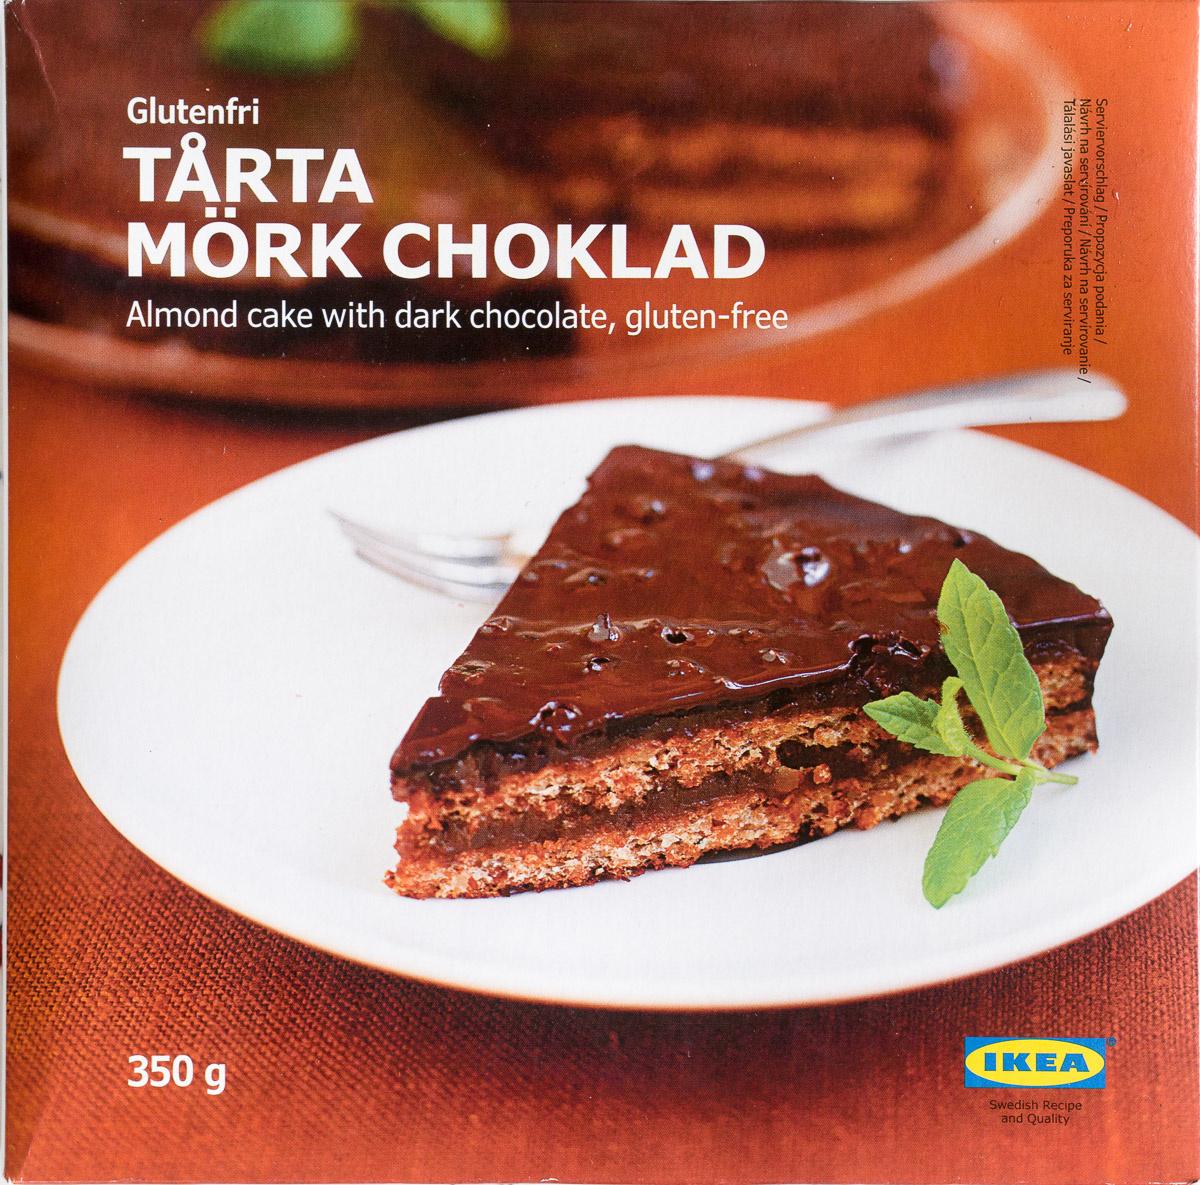 Tarta Mork Choklad Ikea 350 G